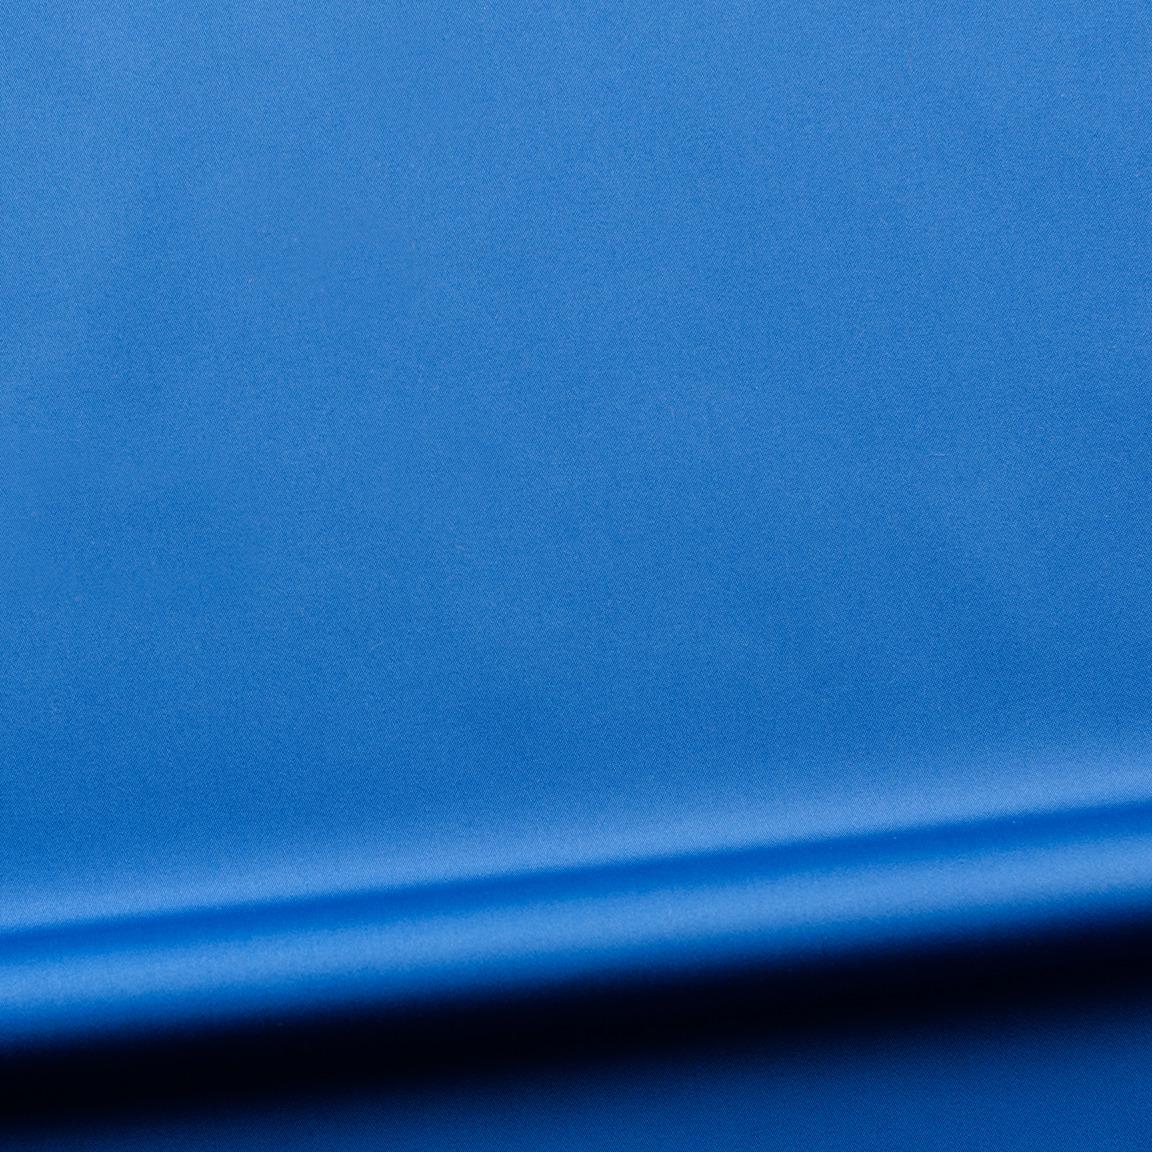 Royale, mid blue